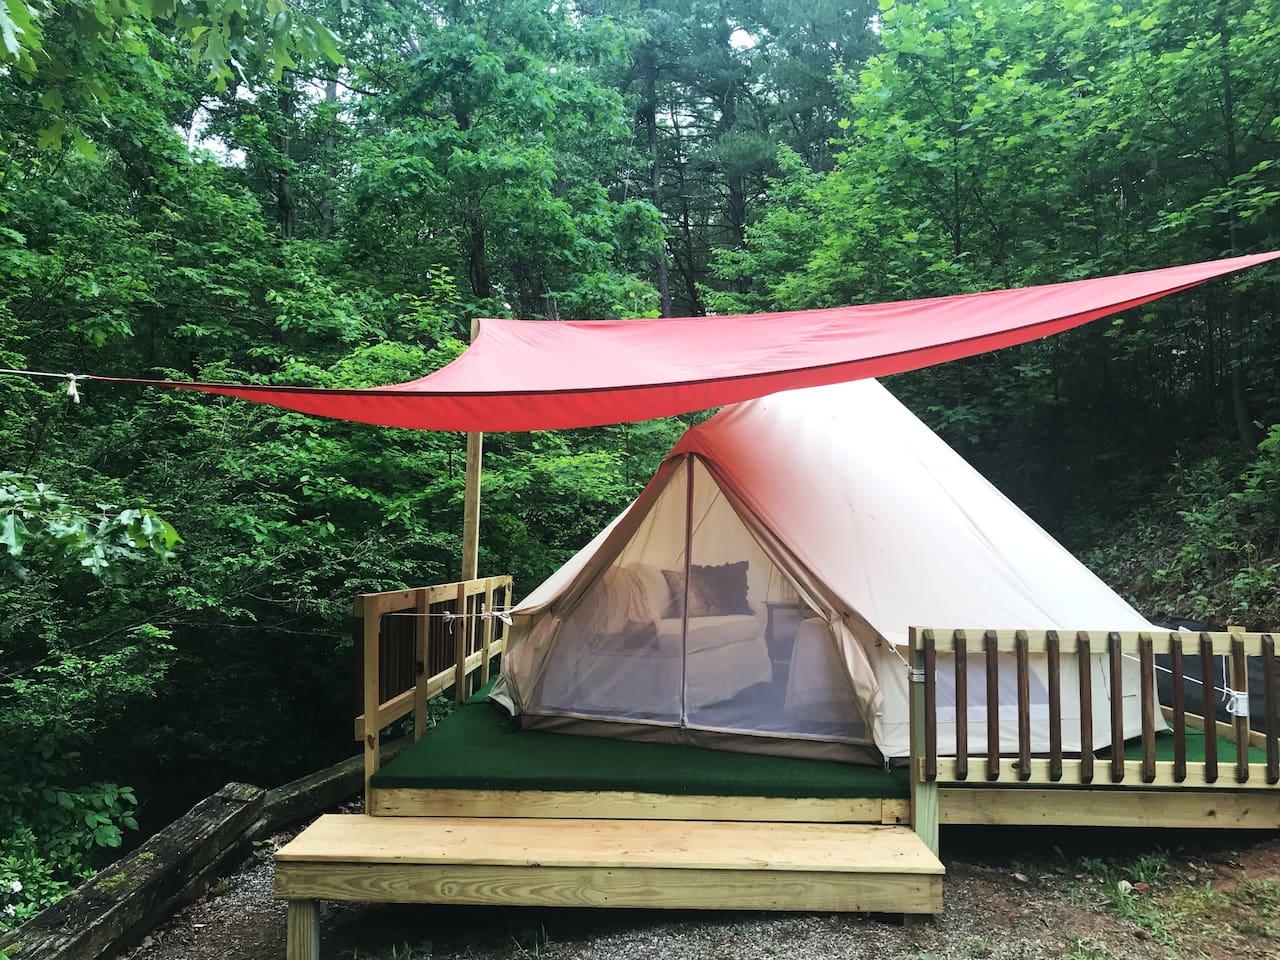 Camping glamping Hollywood style